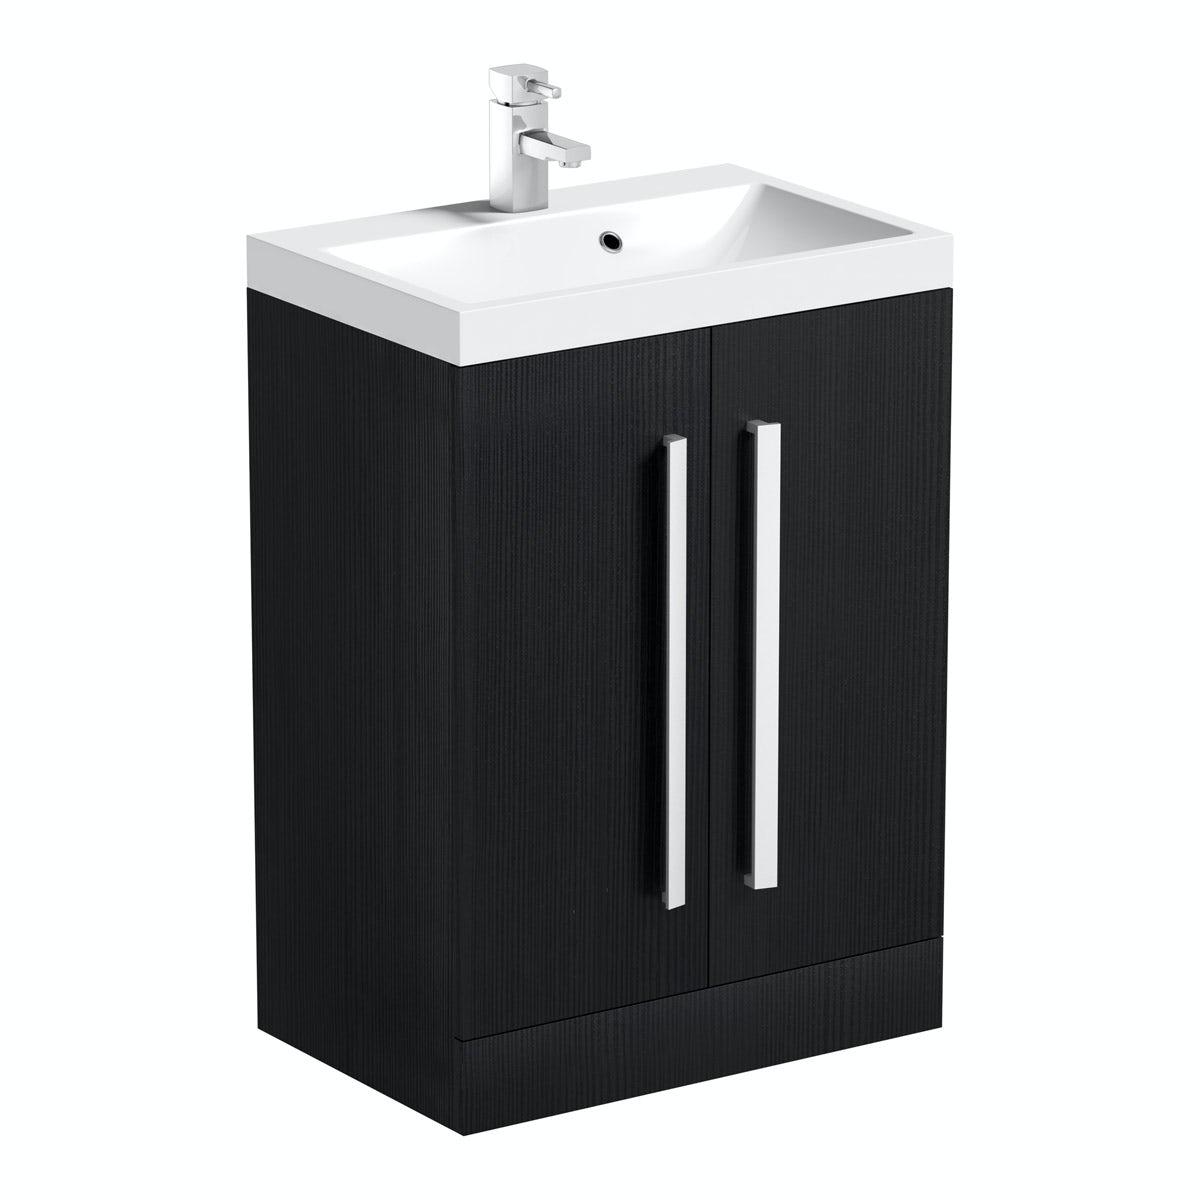 Wye essen 600 vanity unit with basin